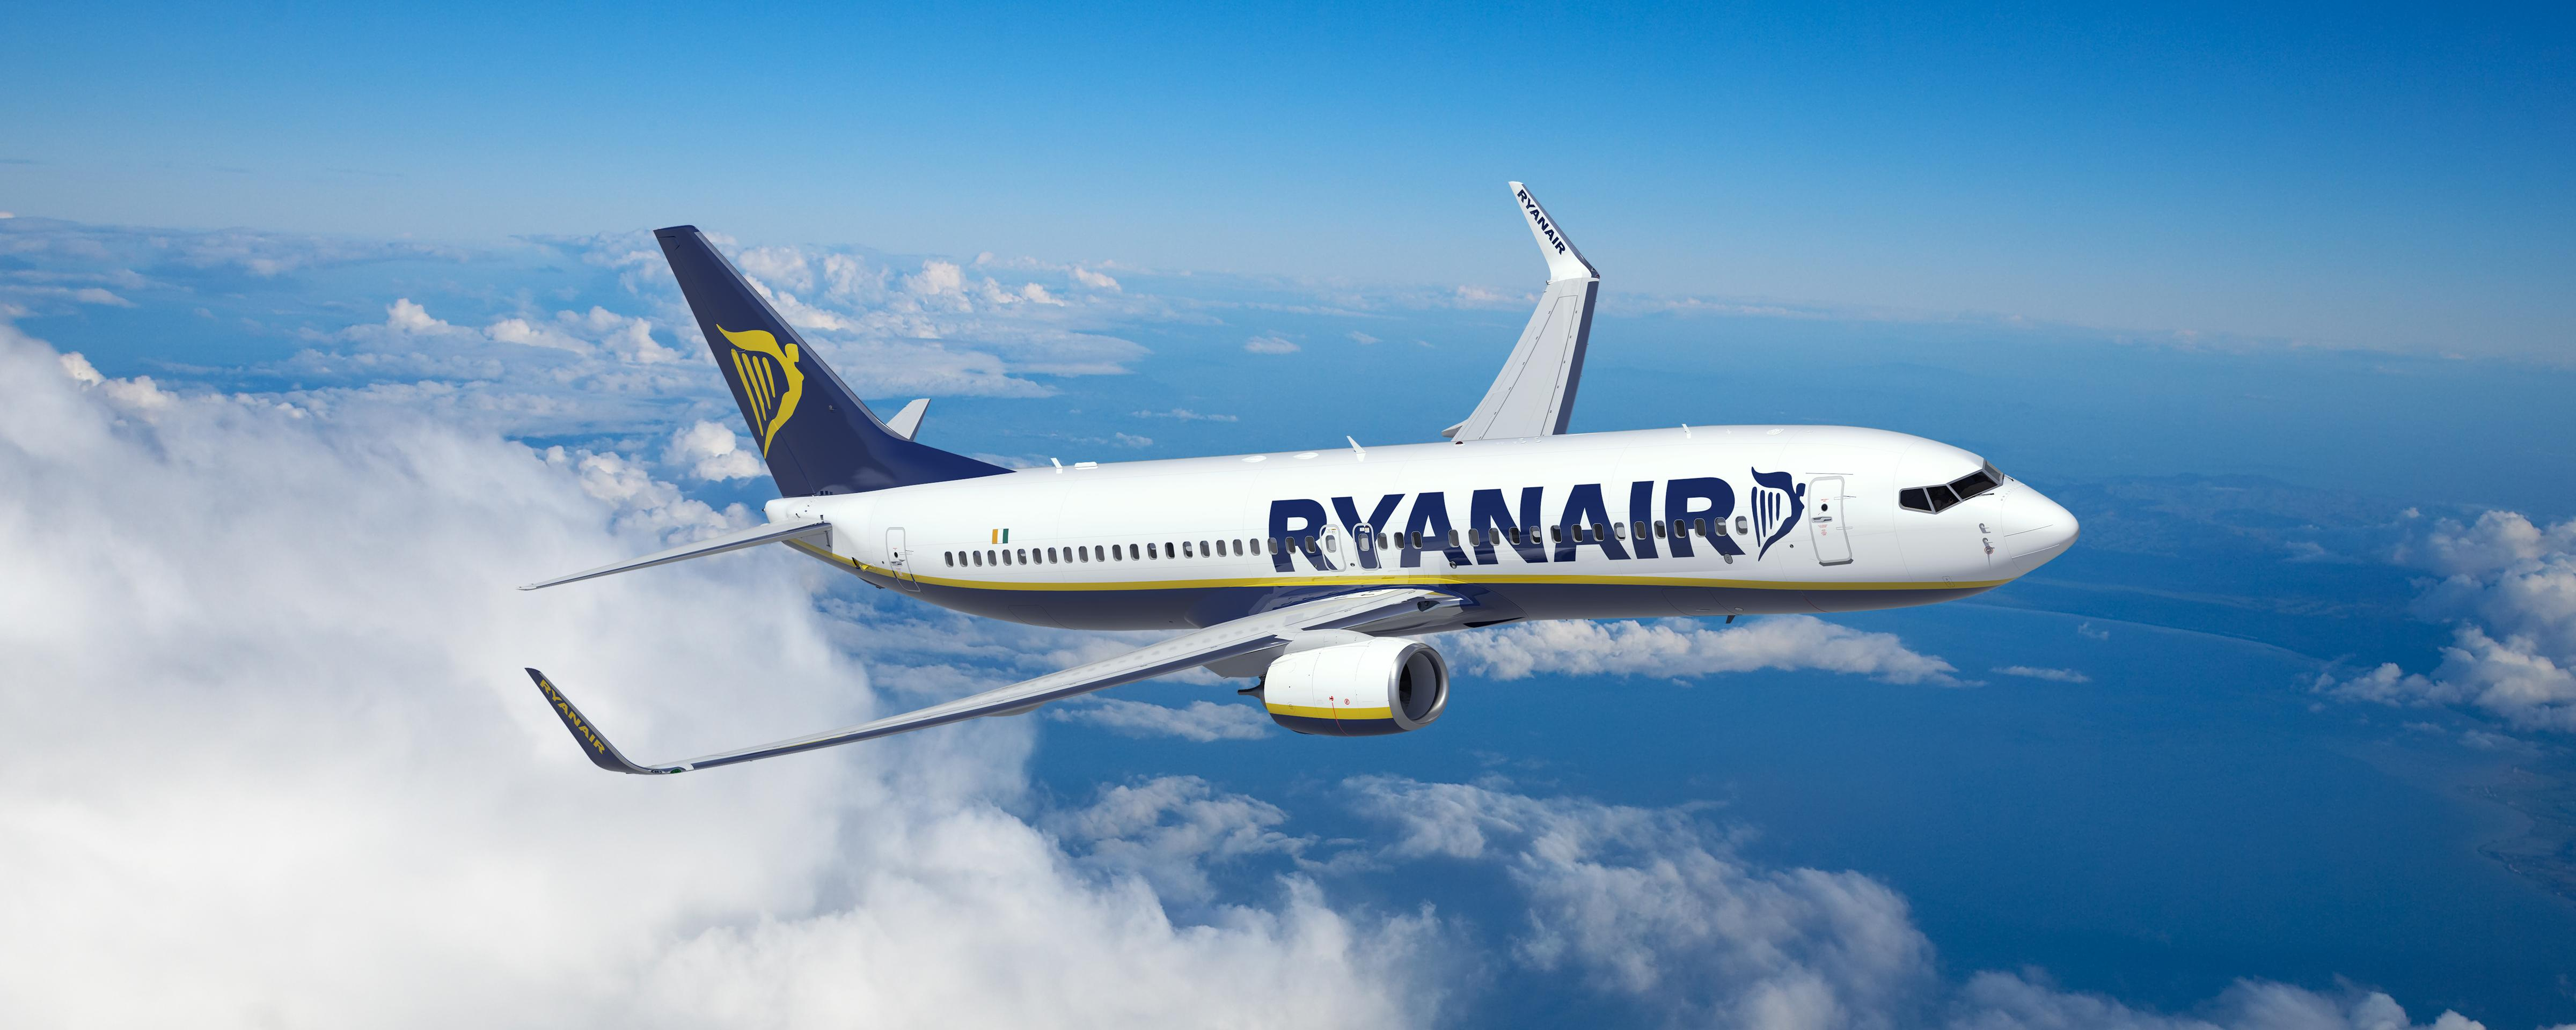 BiH: Rajaner se vratio na banjalučki aerodrom